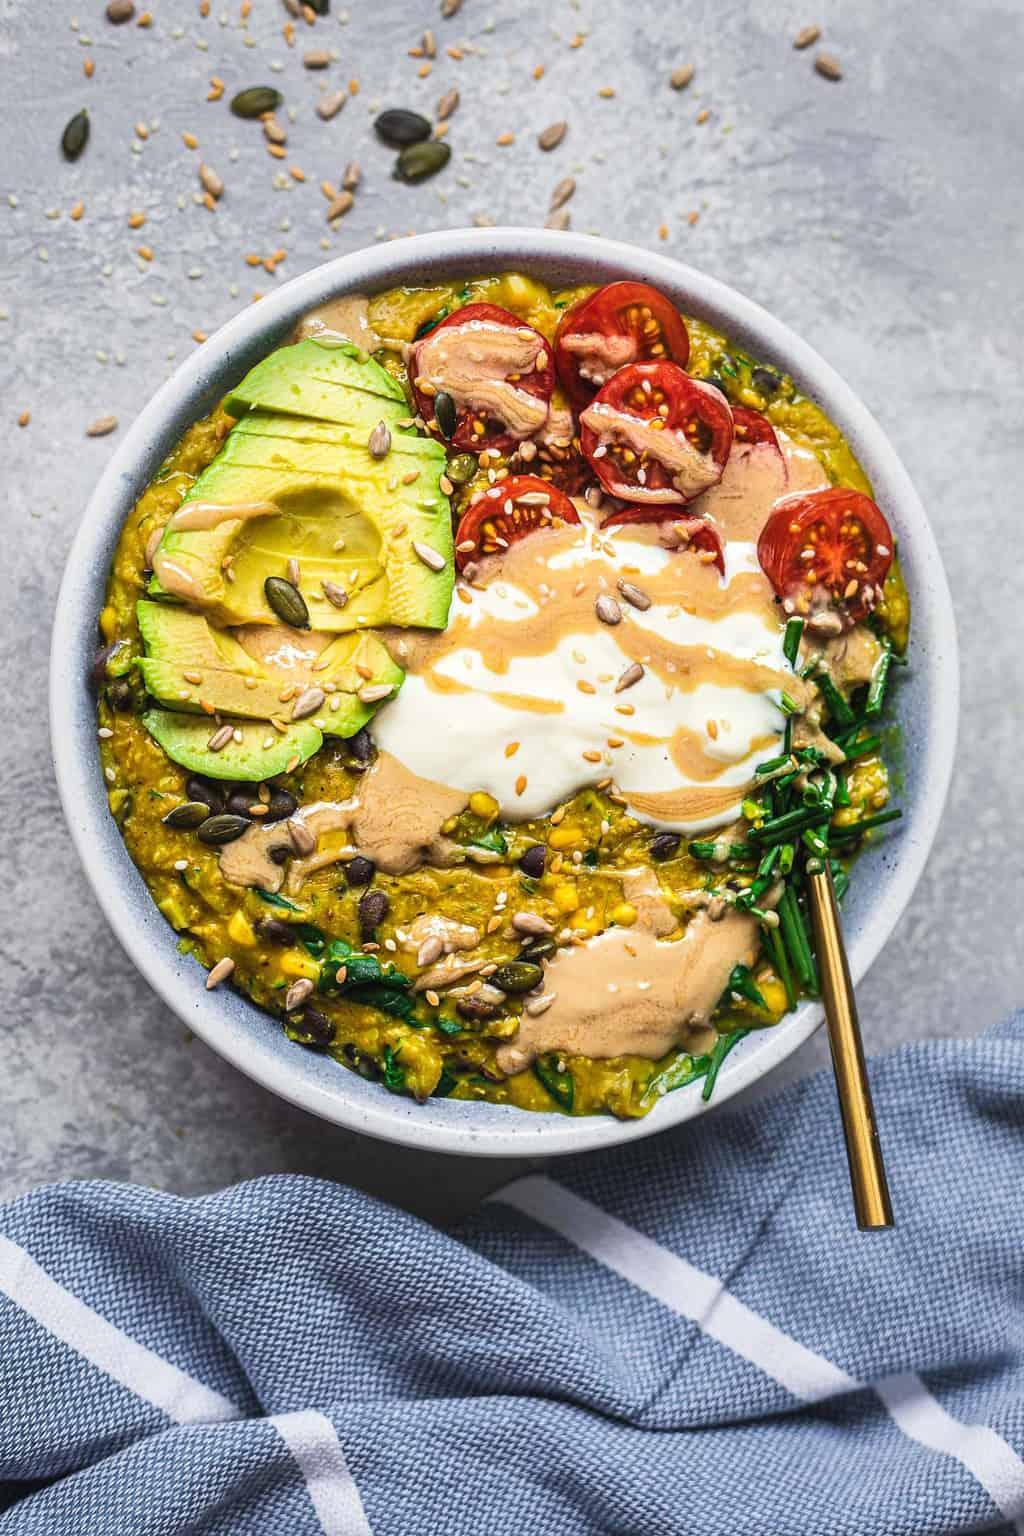 Easy vegan savoury porridge